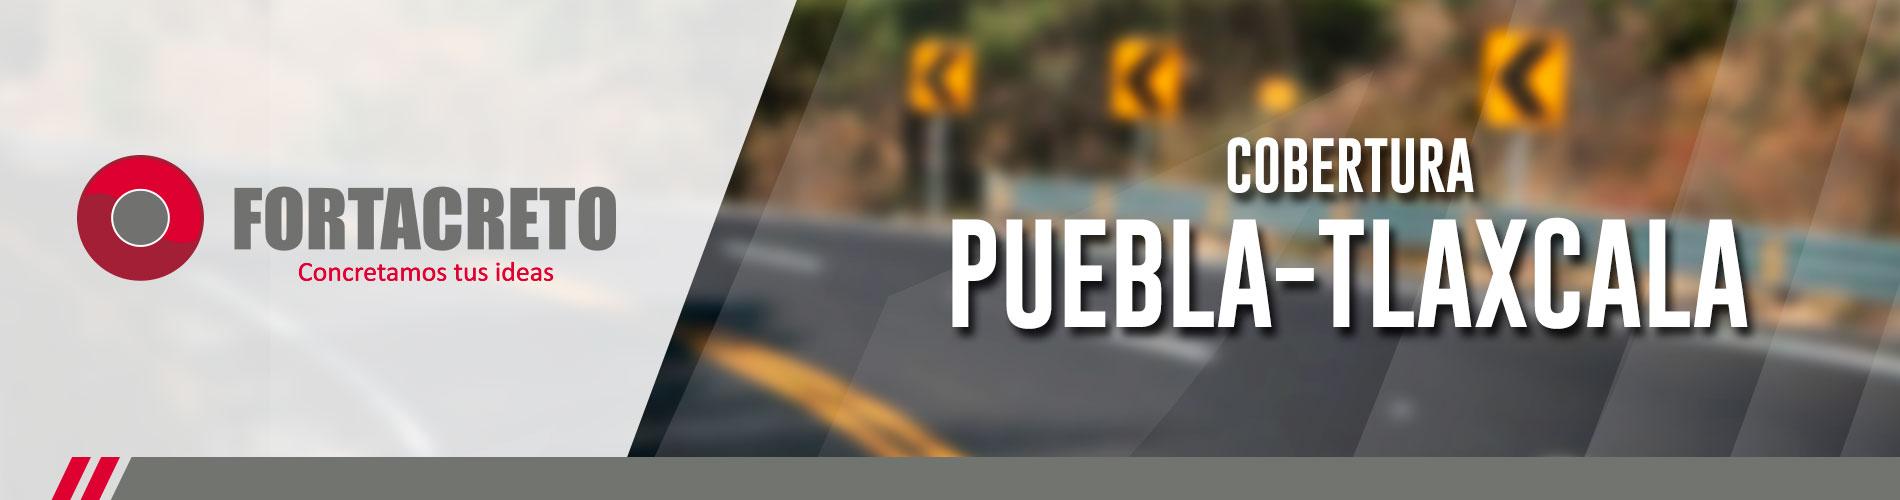 Cobertura Puebla-Tlaxcala